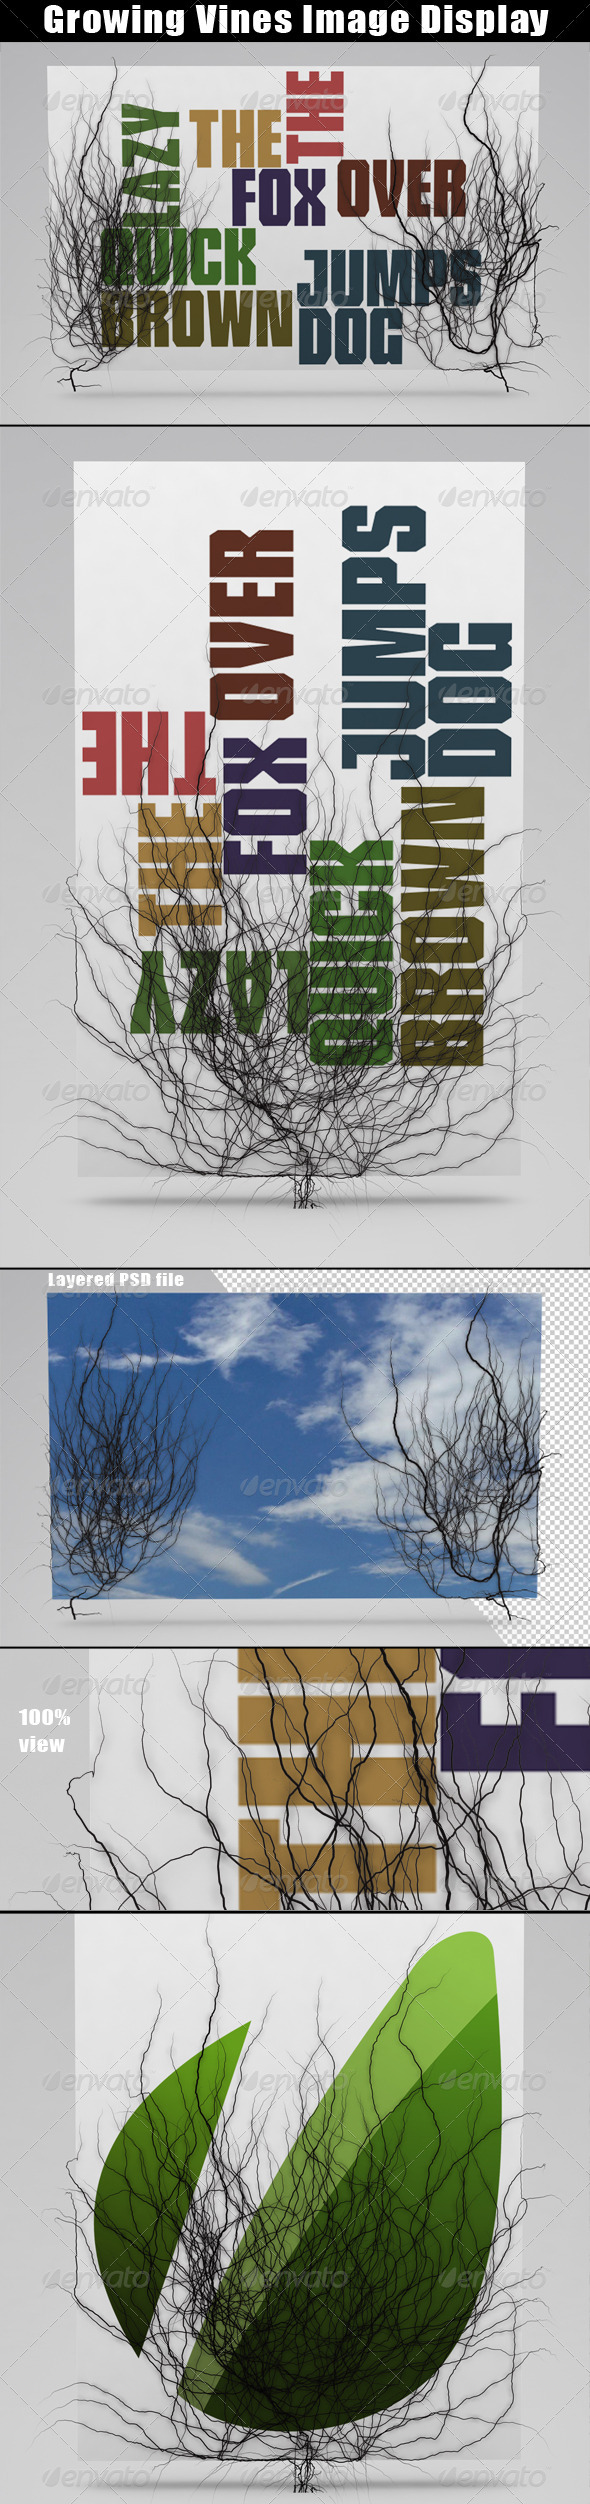 GraphicRiver Growing Vines Image Display 1574206